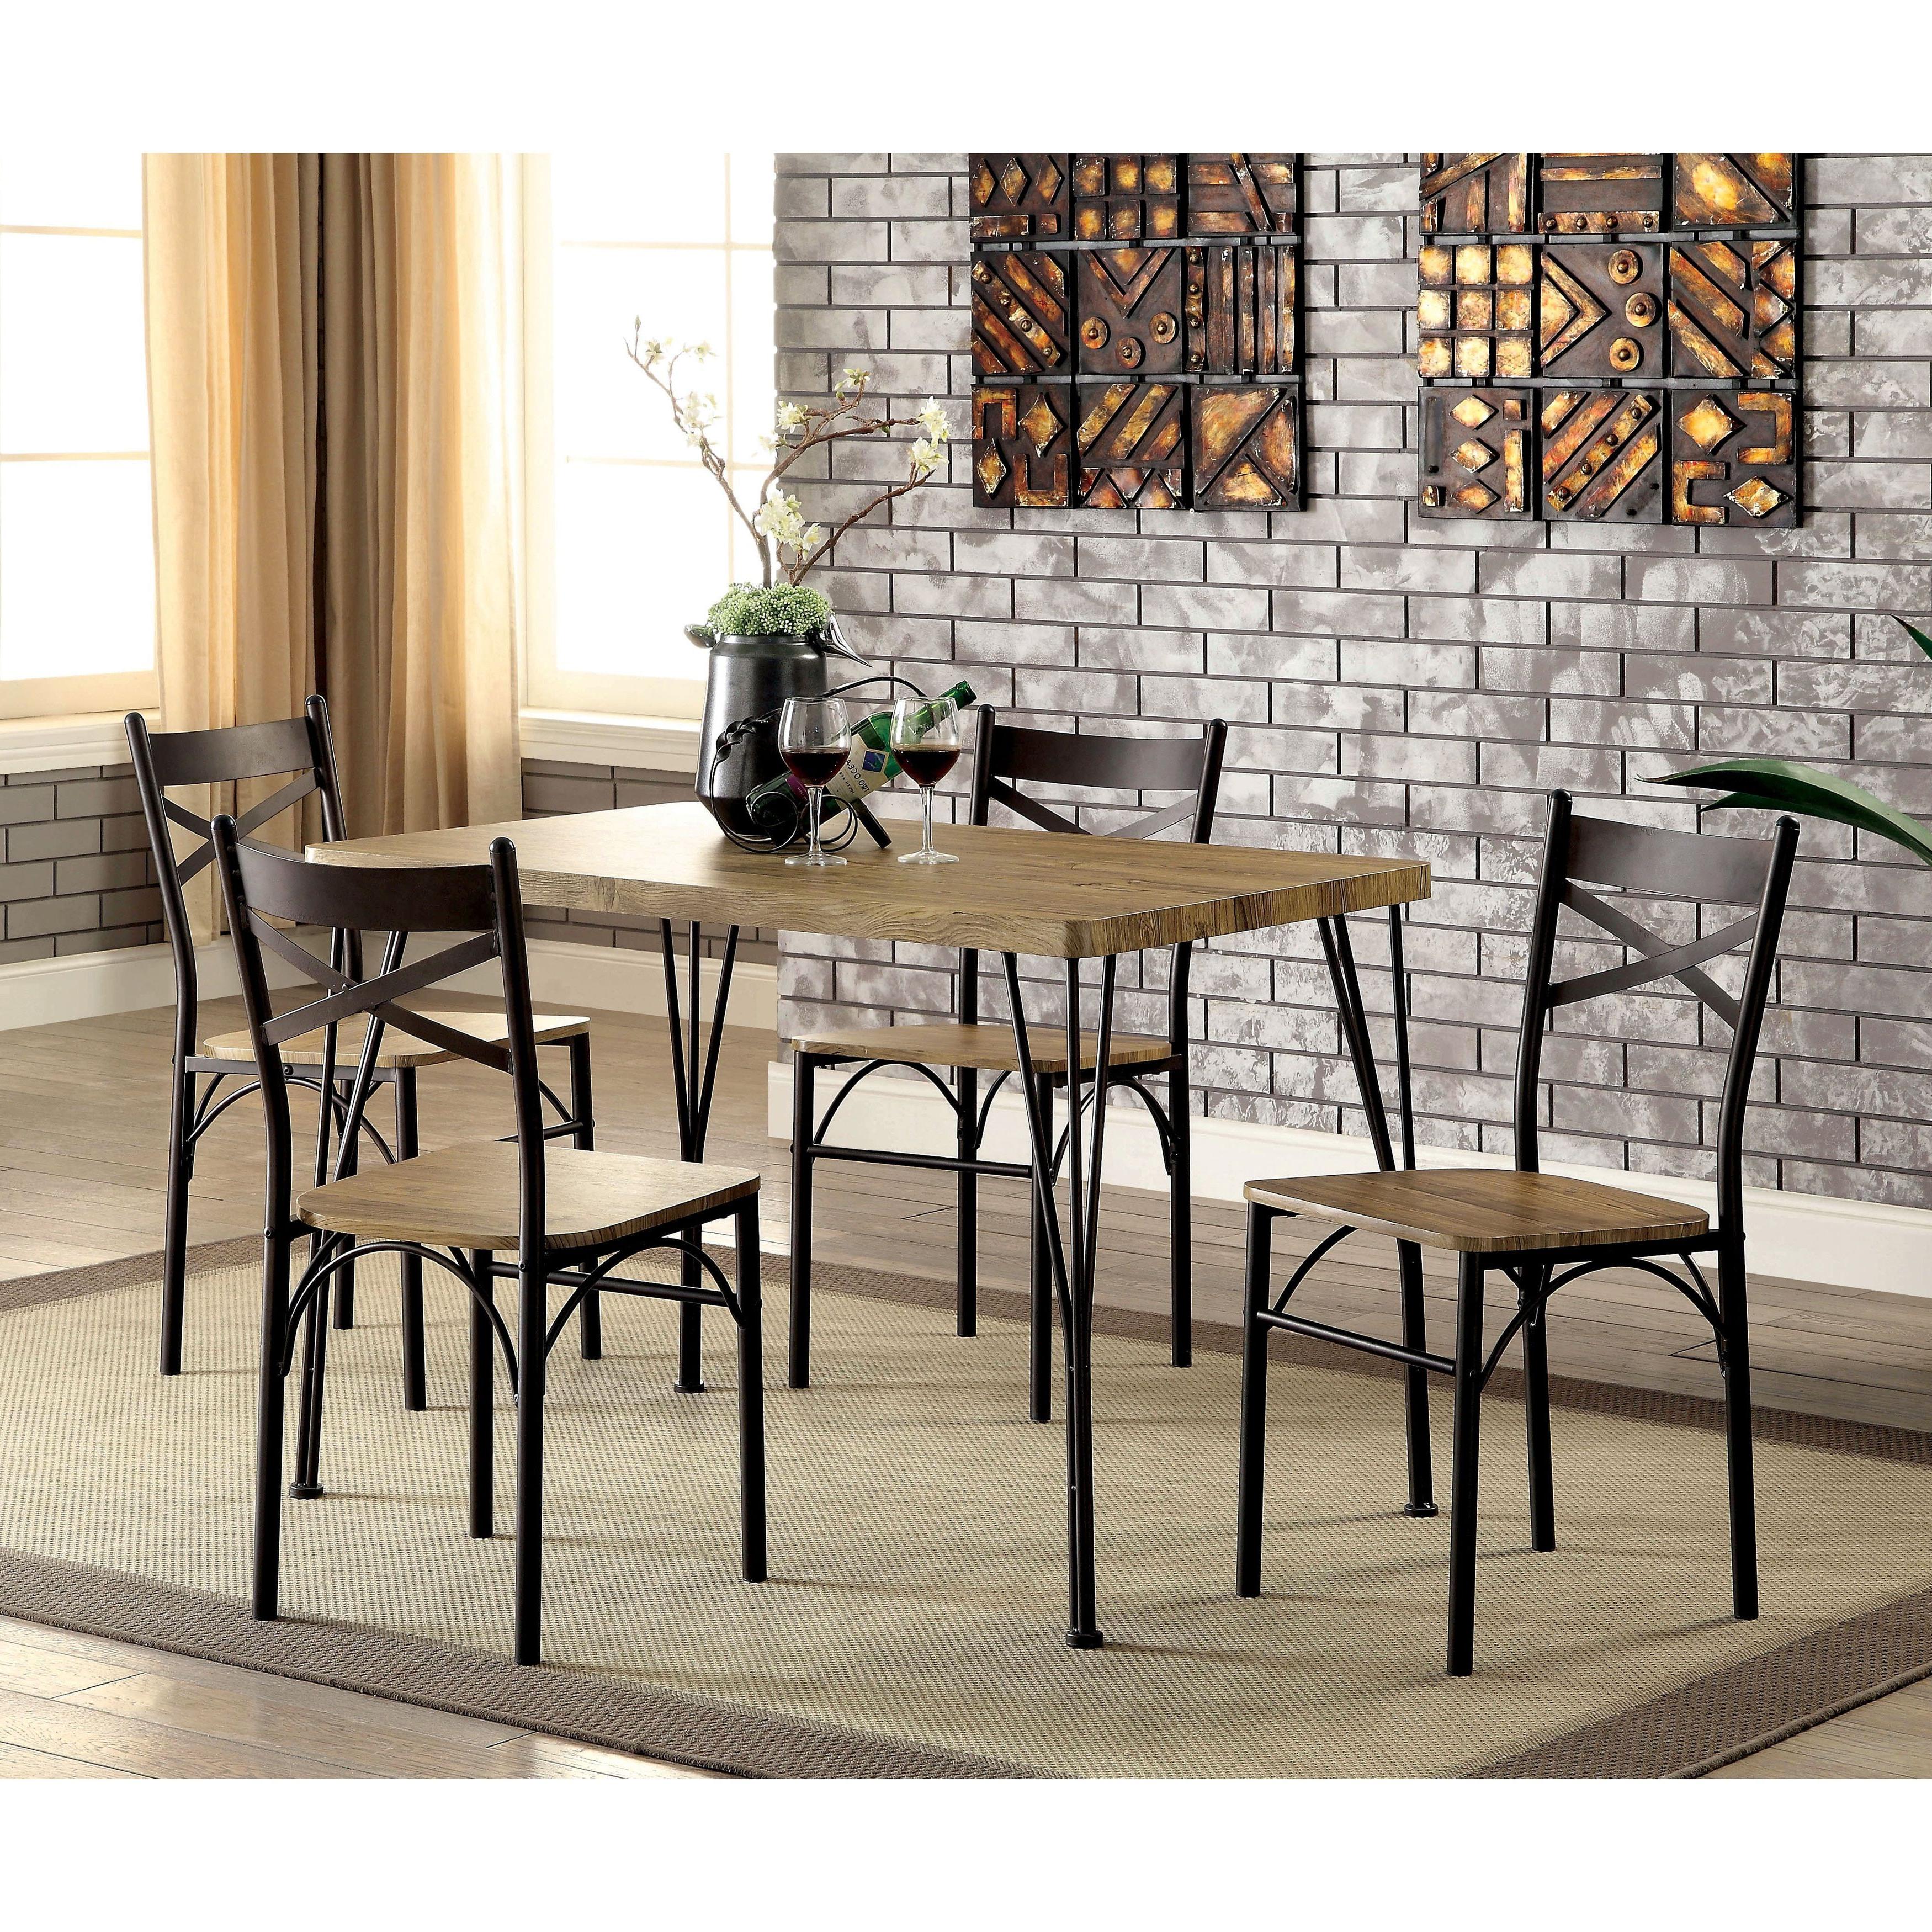 Middleport 5 Piece Dining Sets Regarding 2018 Furniture Of America Hathway Industrial 5 Piece Dark Bronze Small (View 14 of 20)